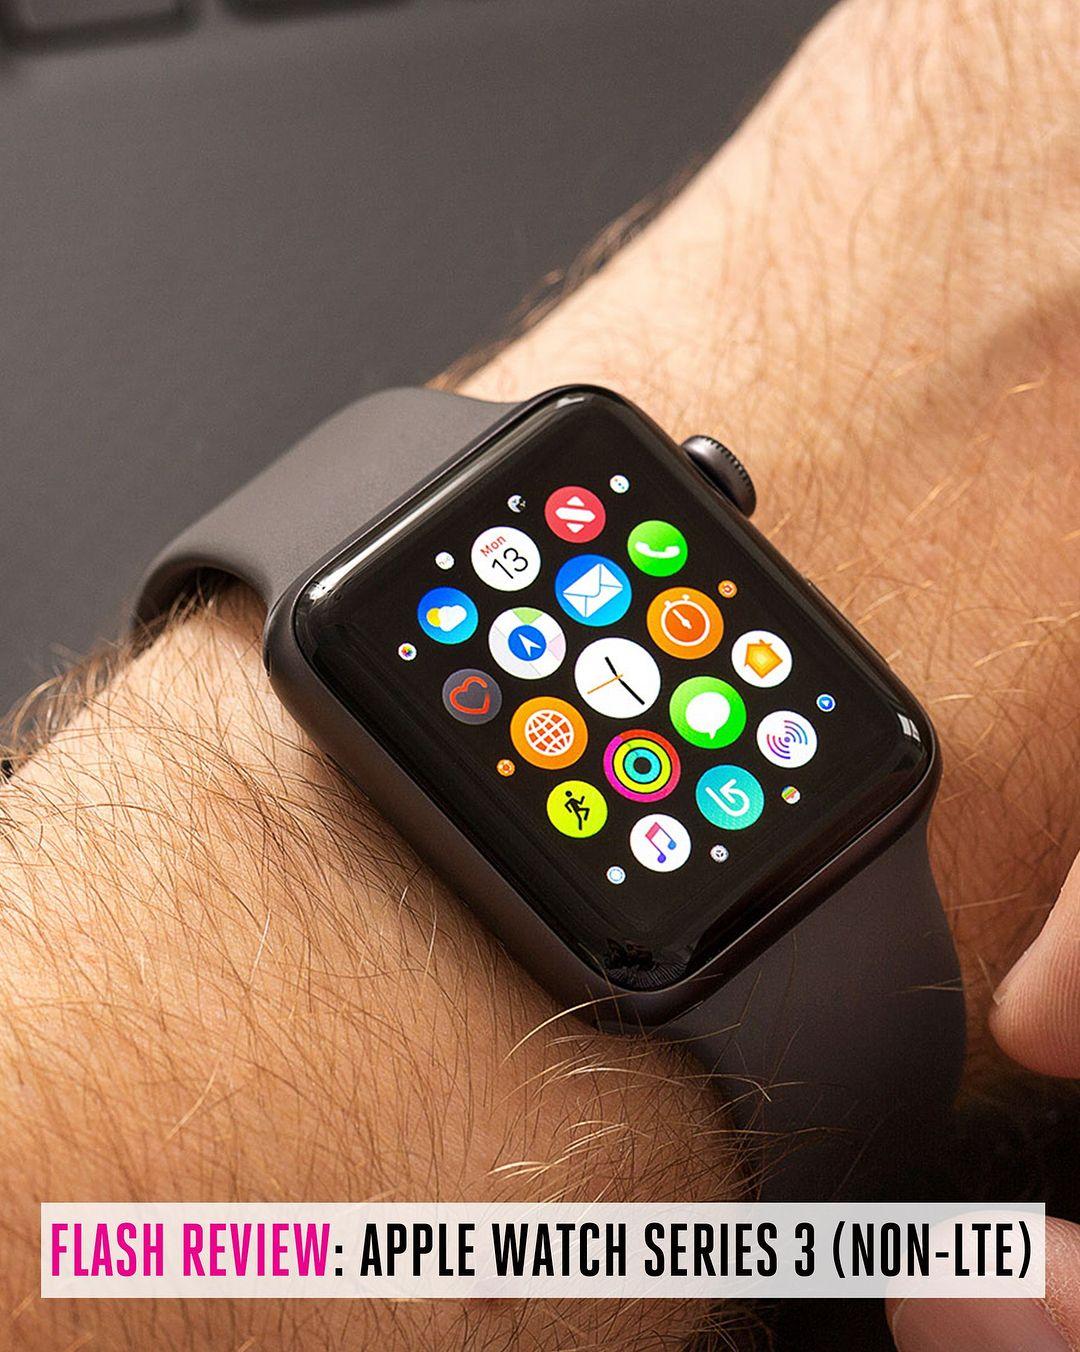 Pin by Ounce on Techere Apple watch, Apple watch series